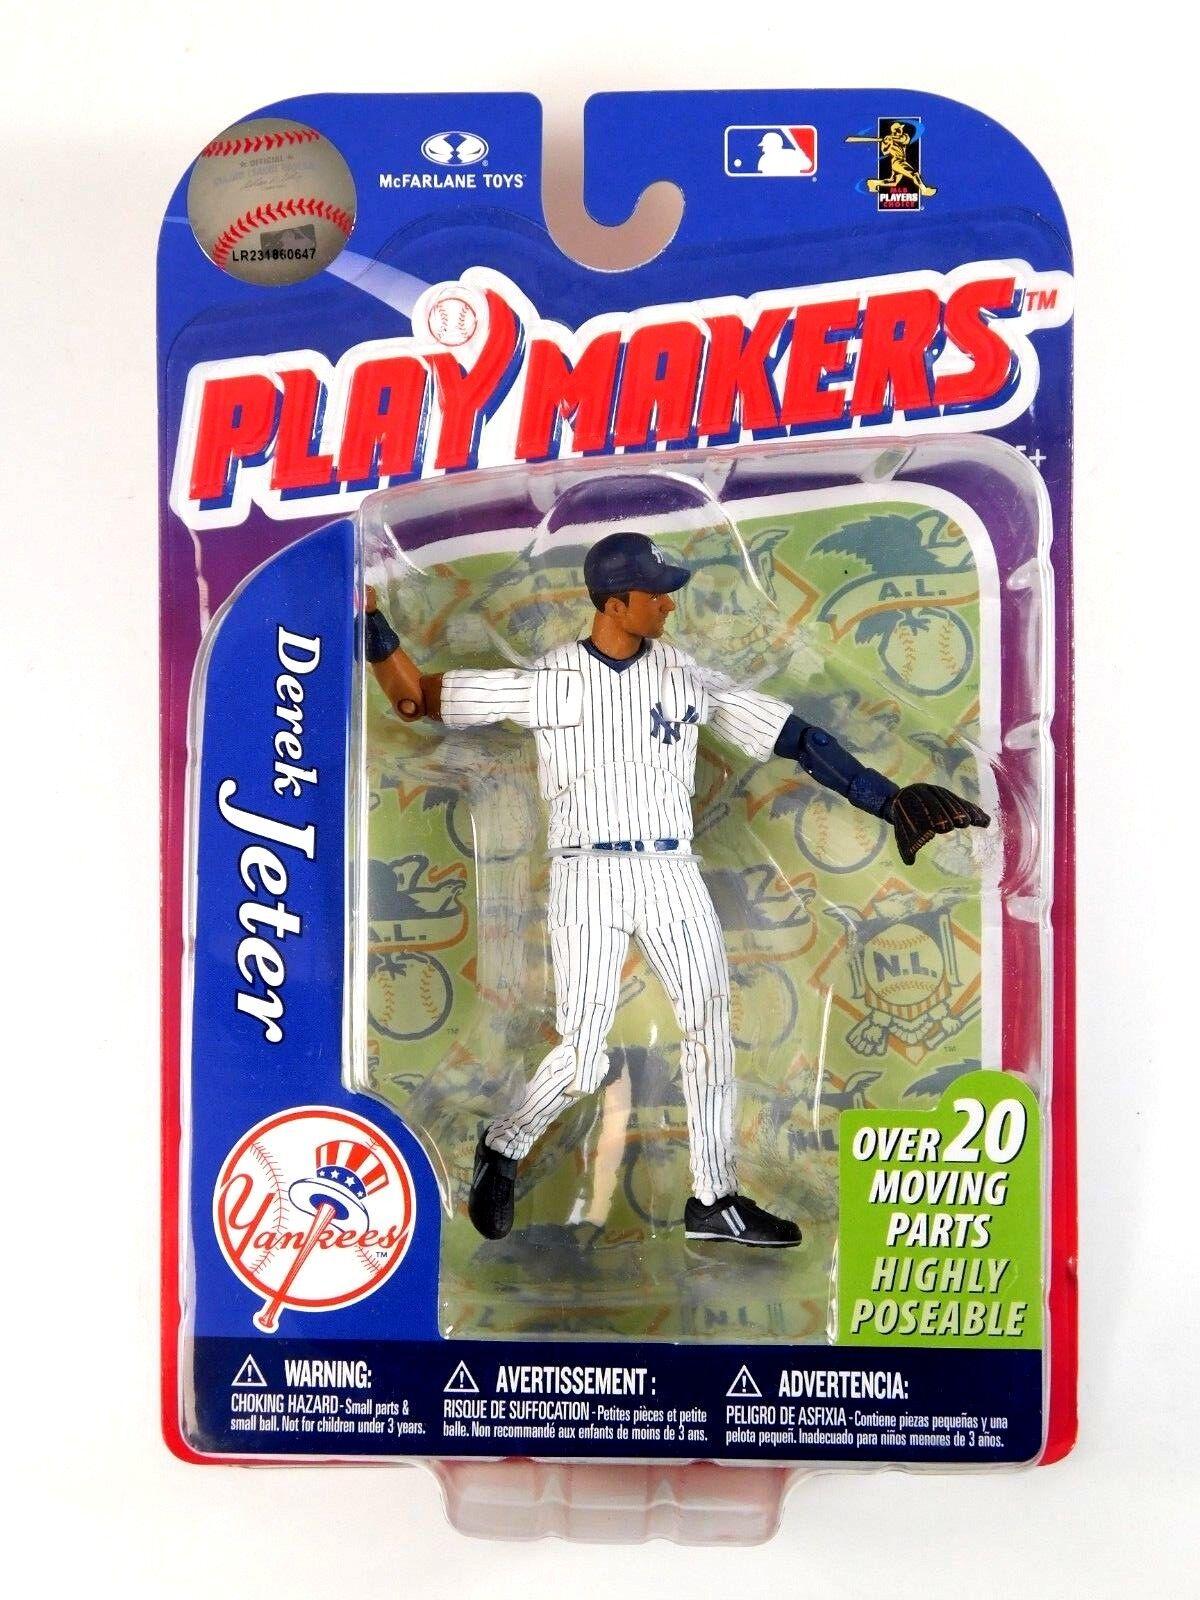 MCFARLANE SPORTS PLAYMAKERS DEREK JETER NEW YORK YANKEES FIGURE 2011 MOC